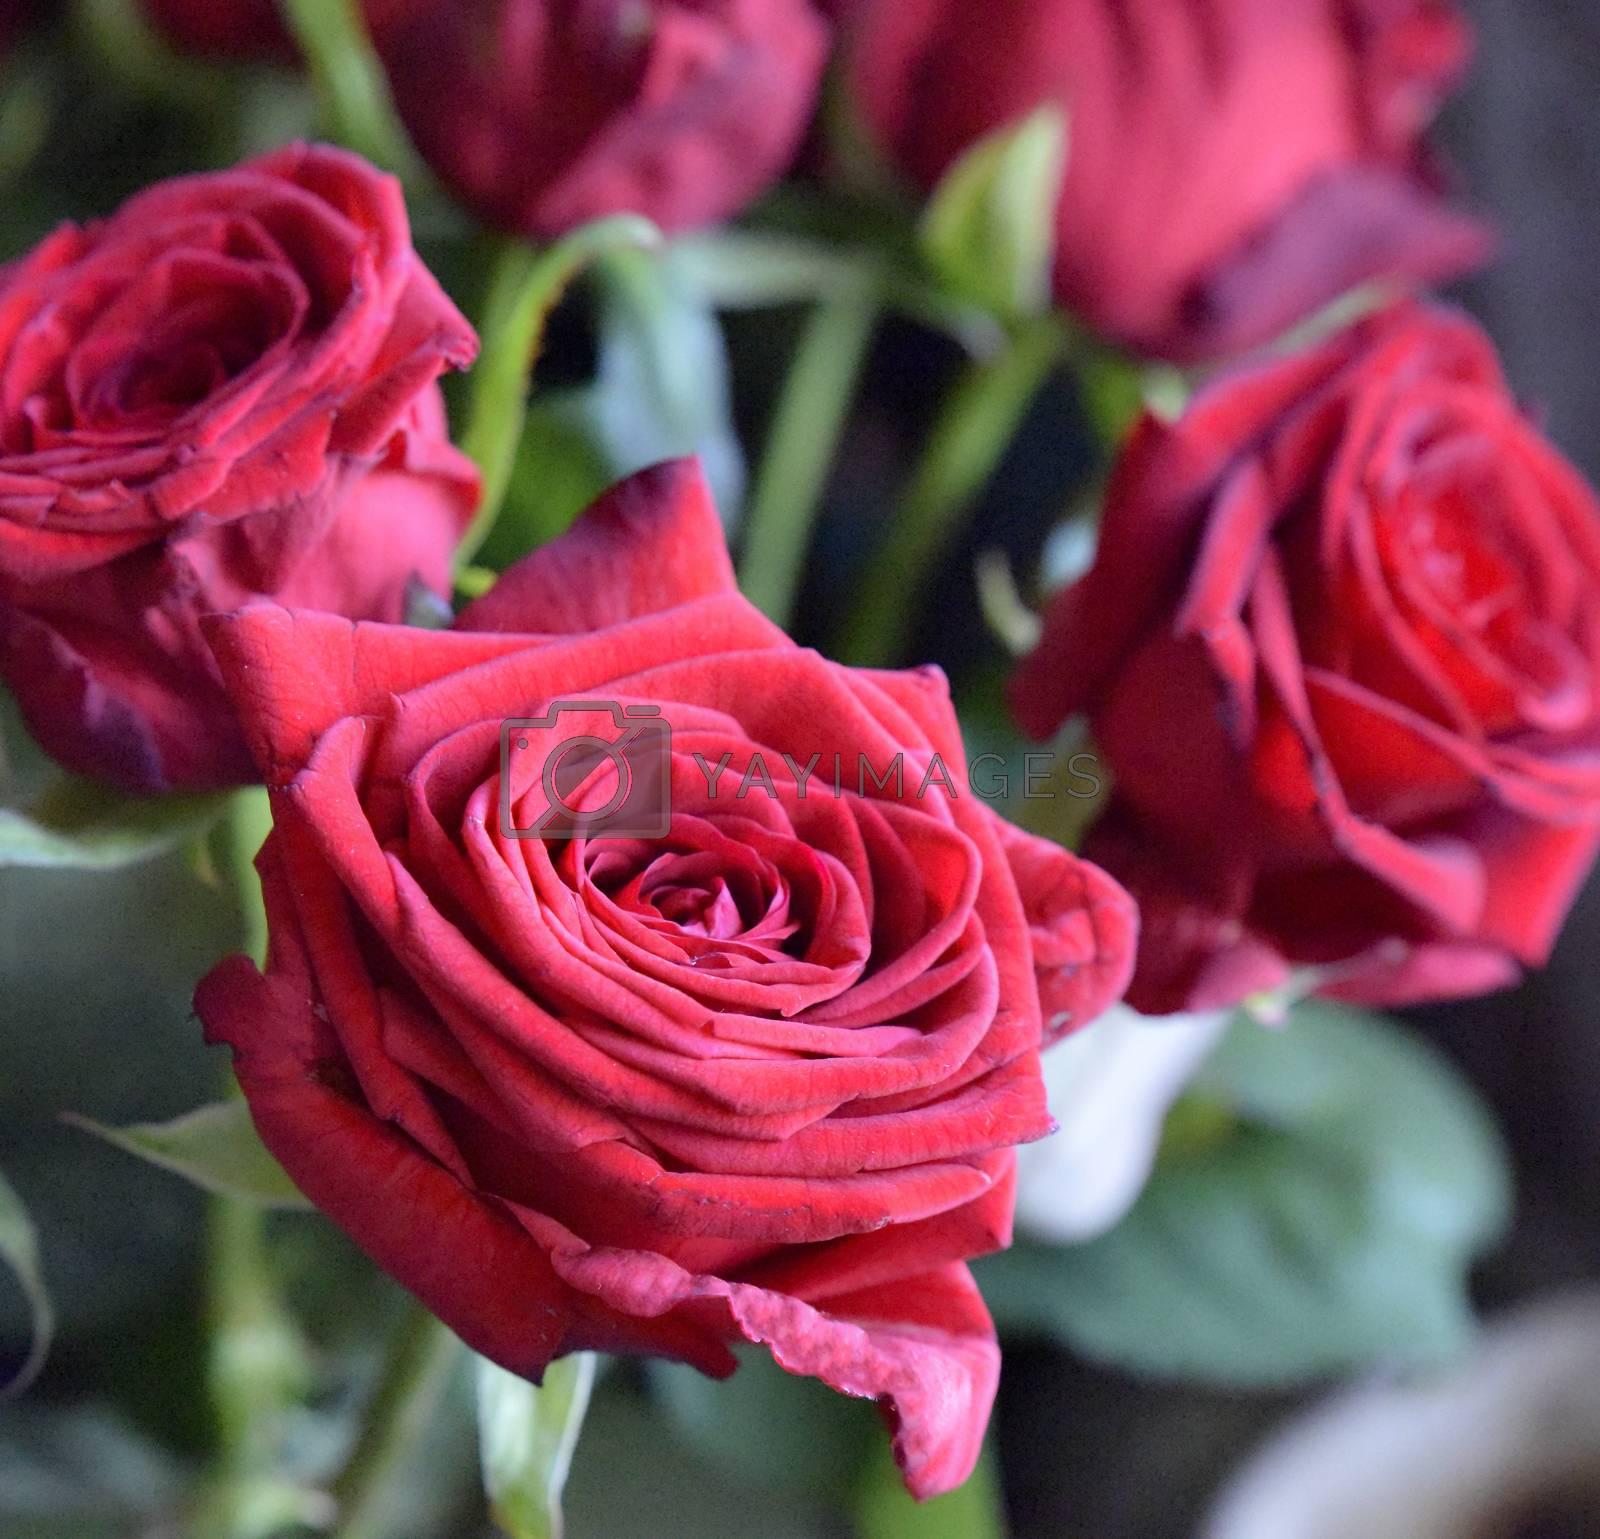 Bouquet of red roses, studio shot. Selective focus. Romance concept.